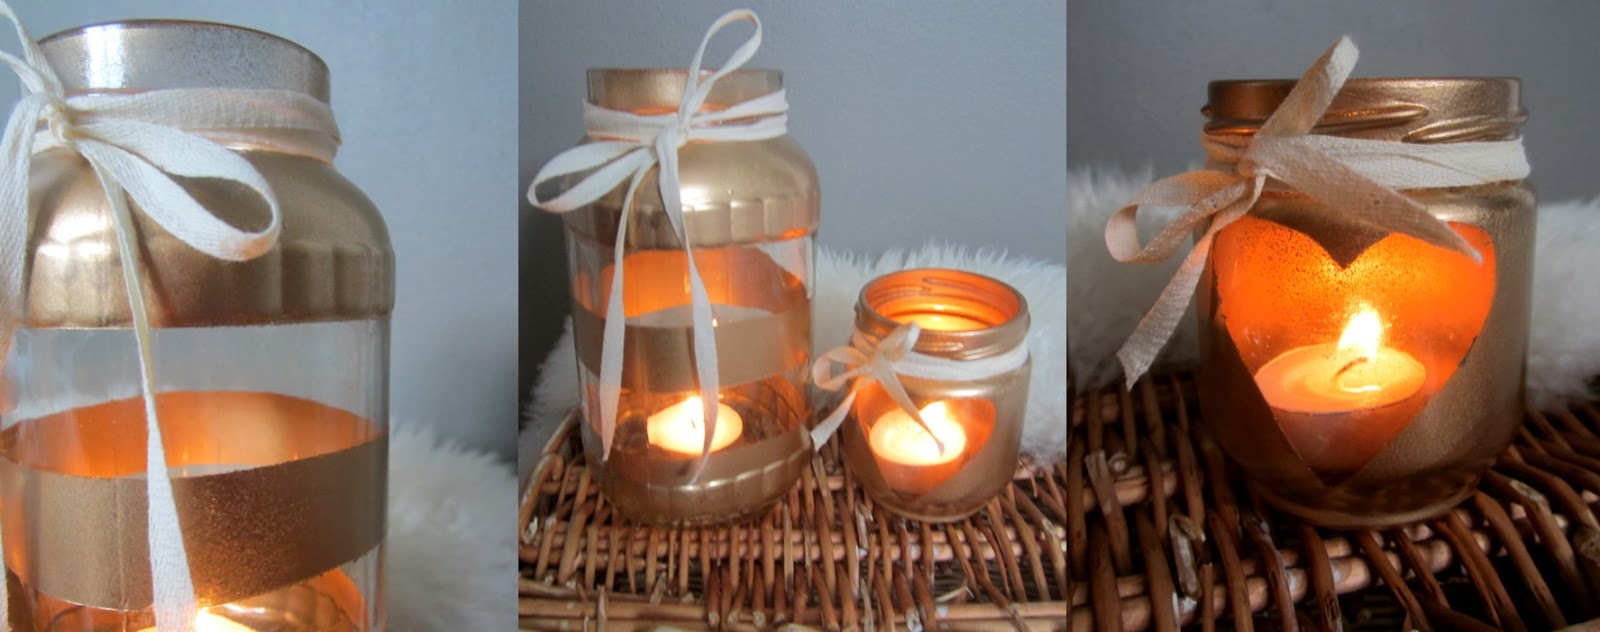 Design Diy Candle Holders diy mason jar candle holders rach speed wednesday december 18 2013